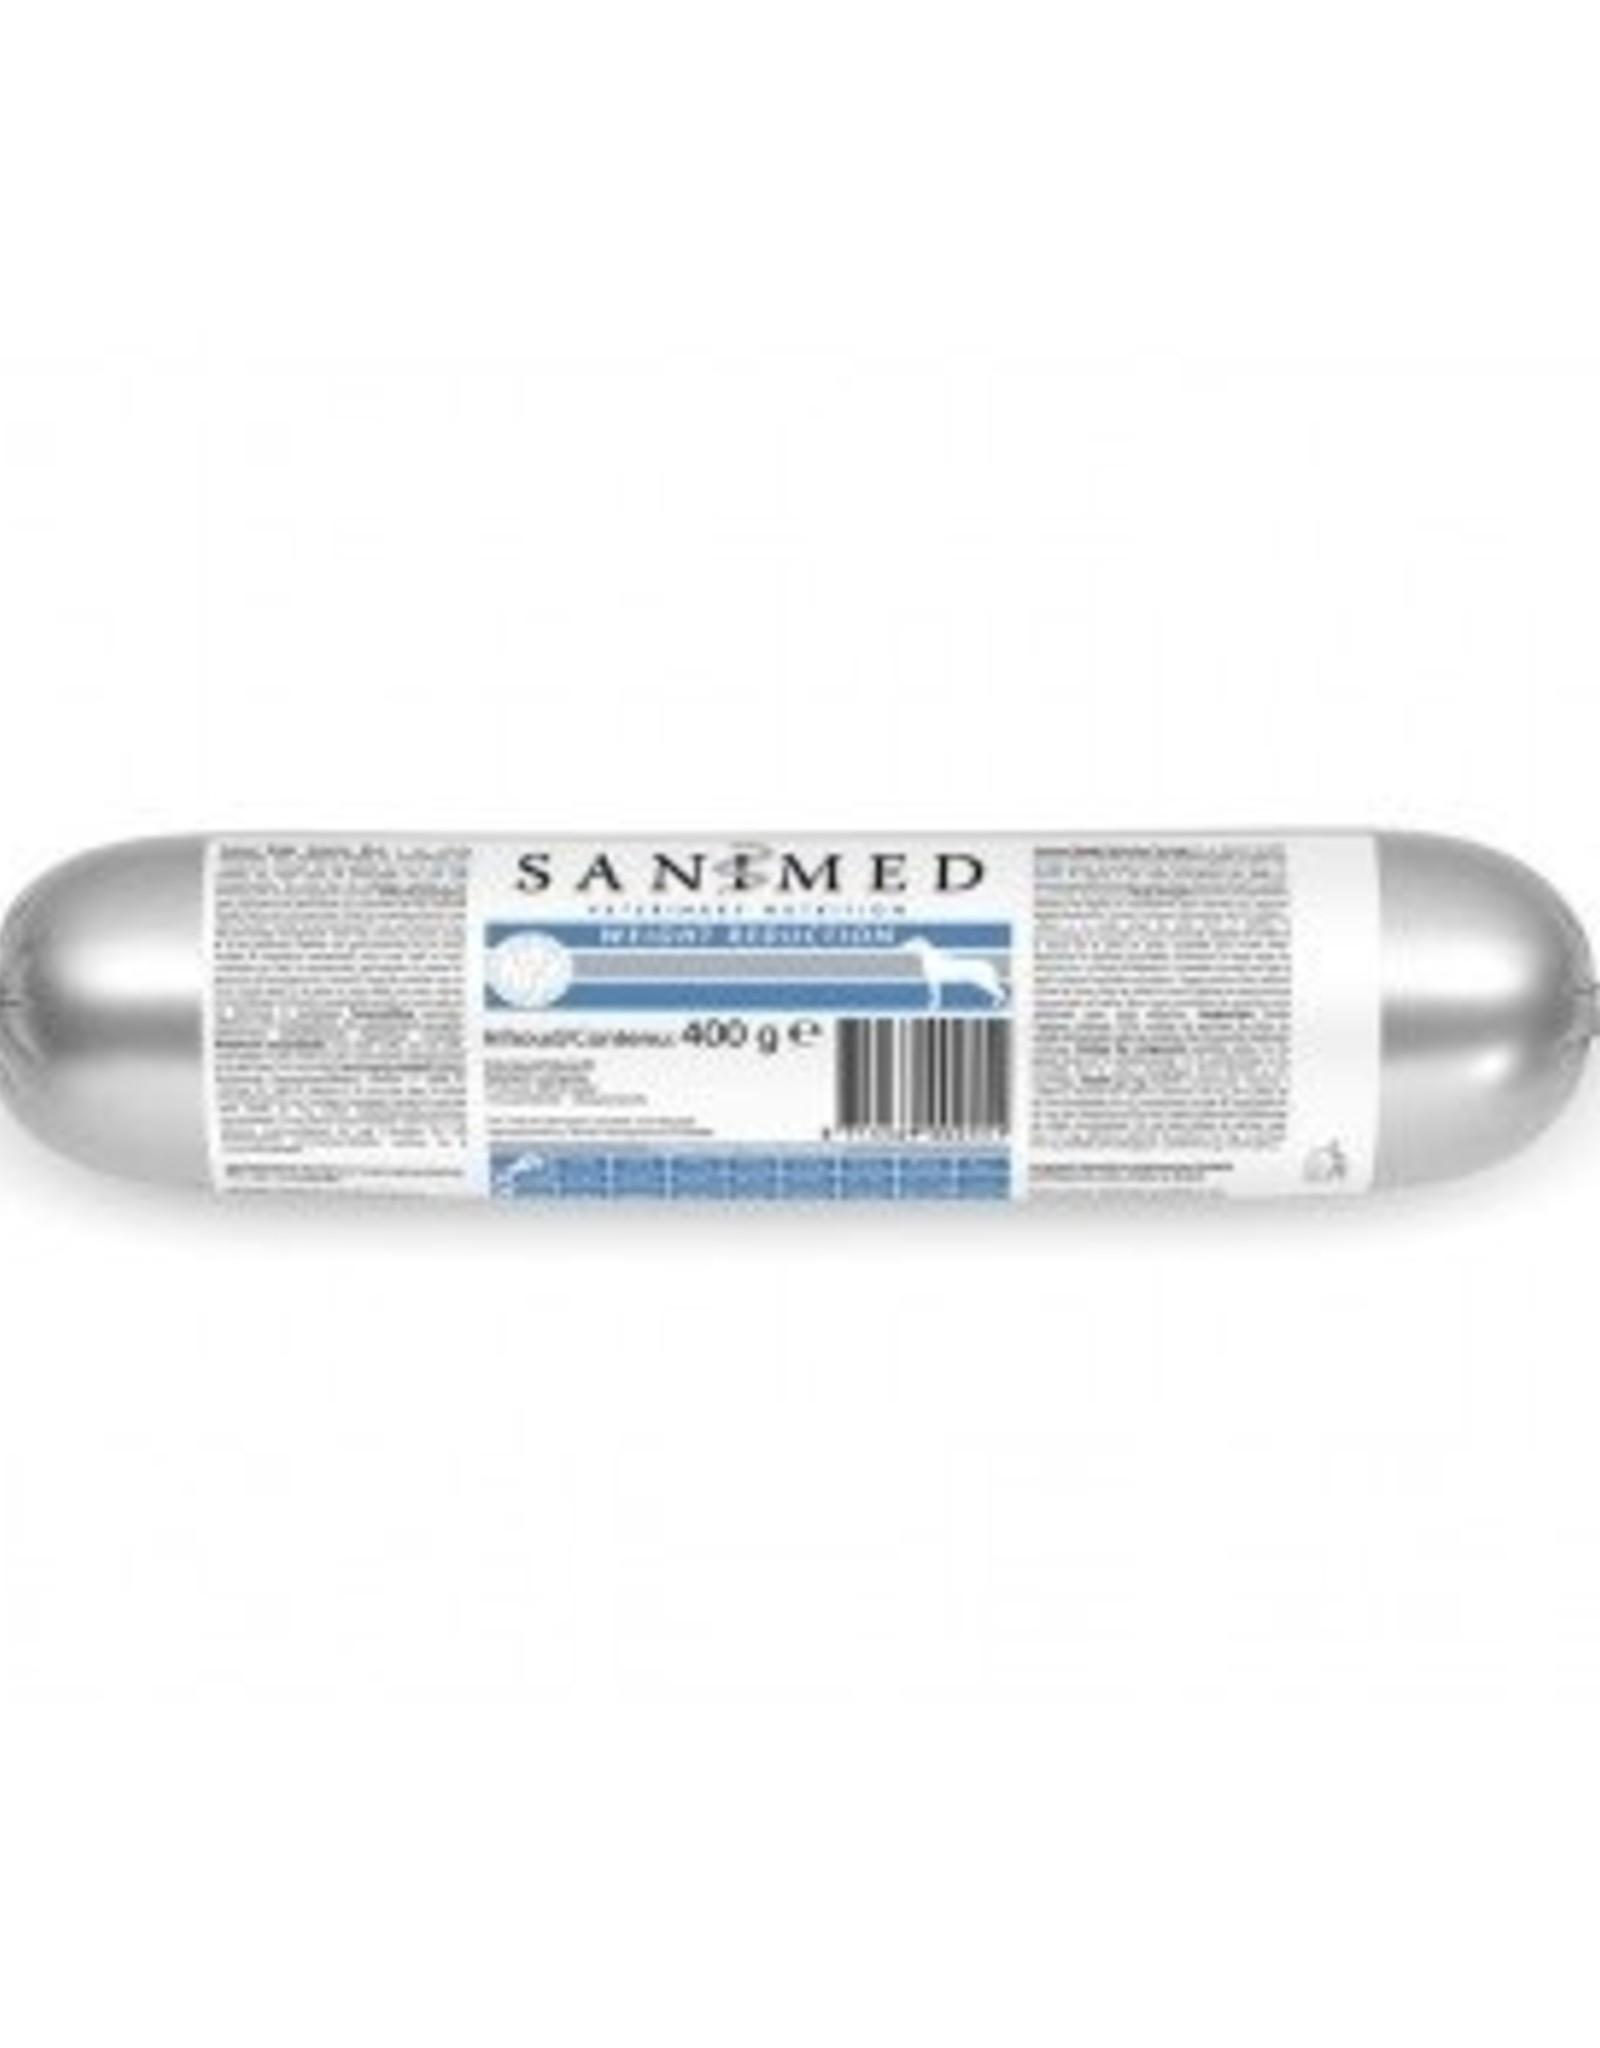 Sanimed Sanimed Wurst Weight Reduction Hund 15x400gr